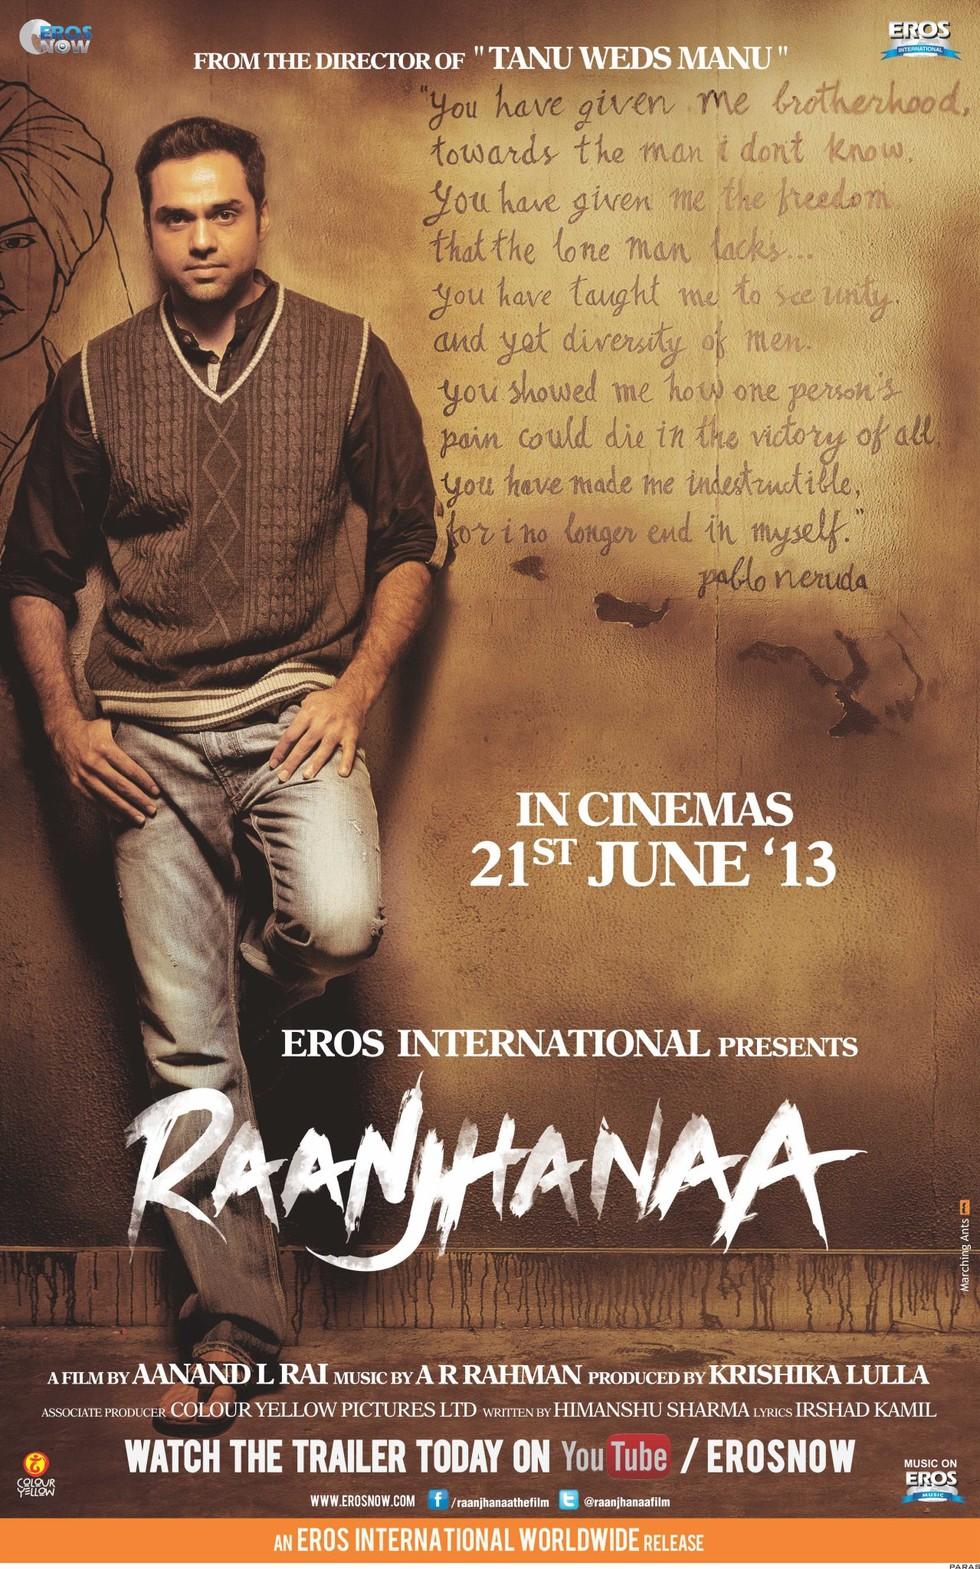 Raanjhanaa - Movie Poster #2 (Large)